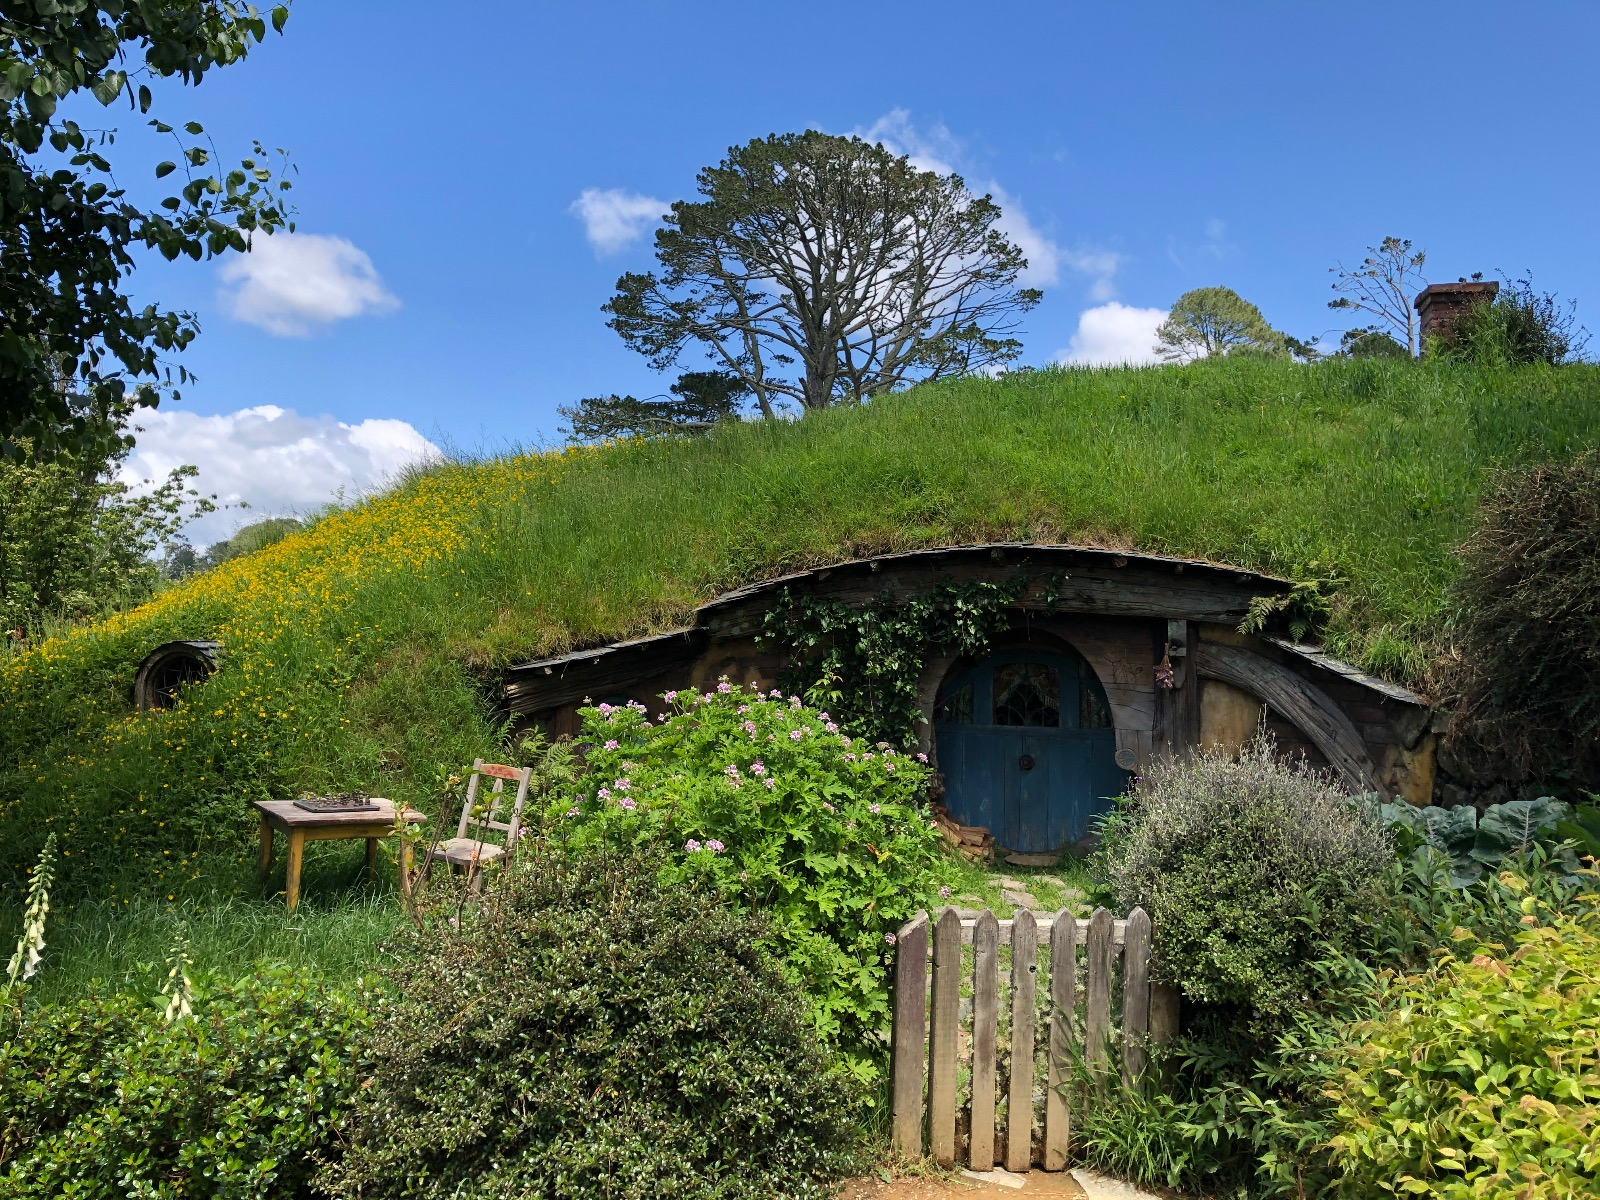 https://www.eberhardt-travel.de/reisebilder/reisetipp/hobbingen-oder-hobbiton-filmkulisse/original/1862506